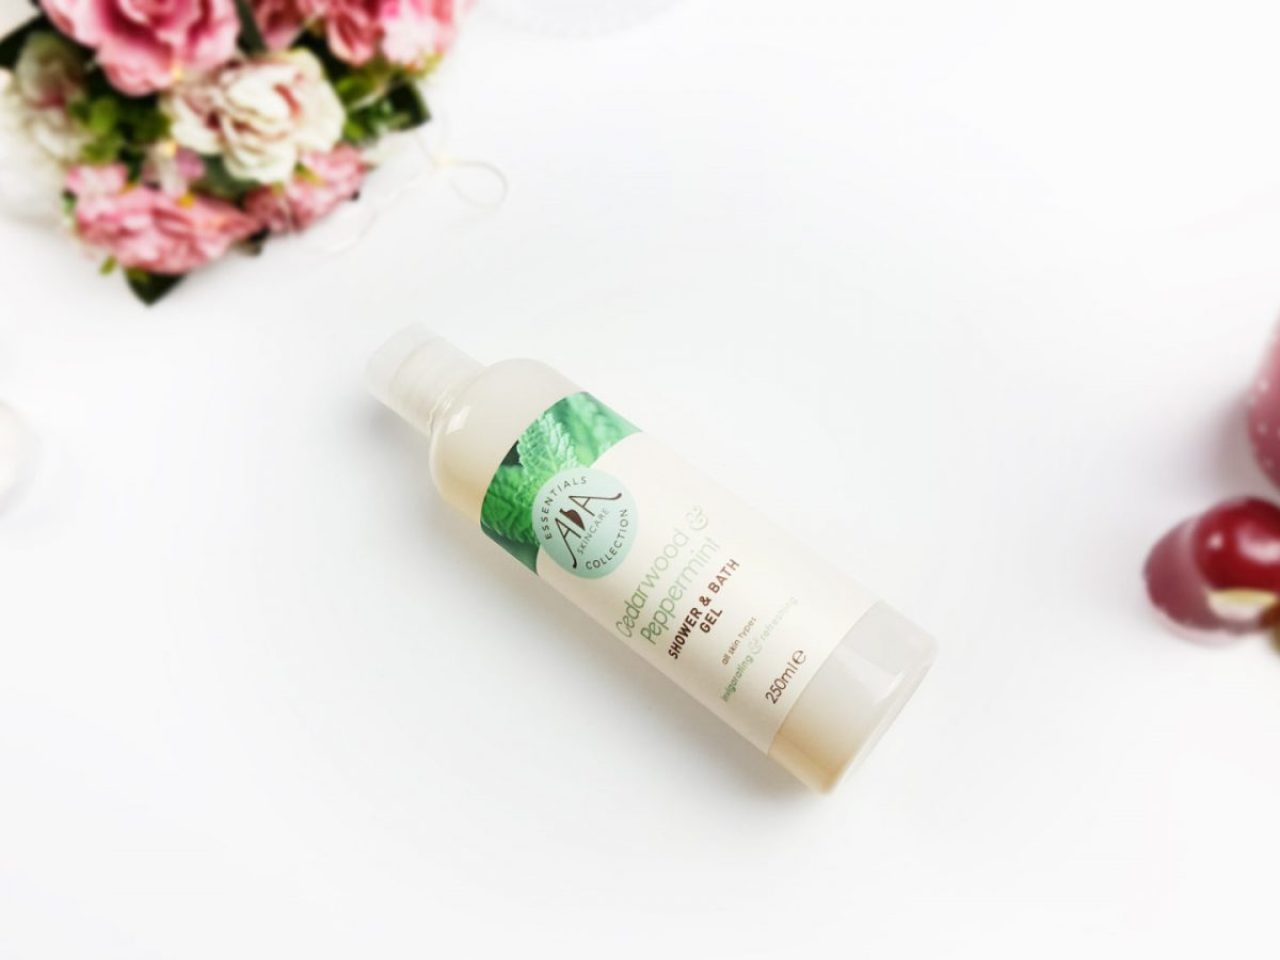 AA Skincare Shower & Bath Gel